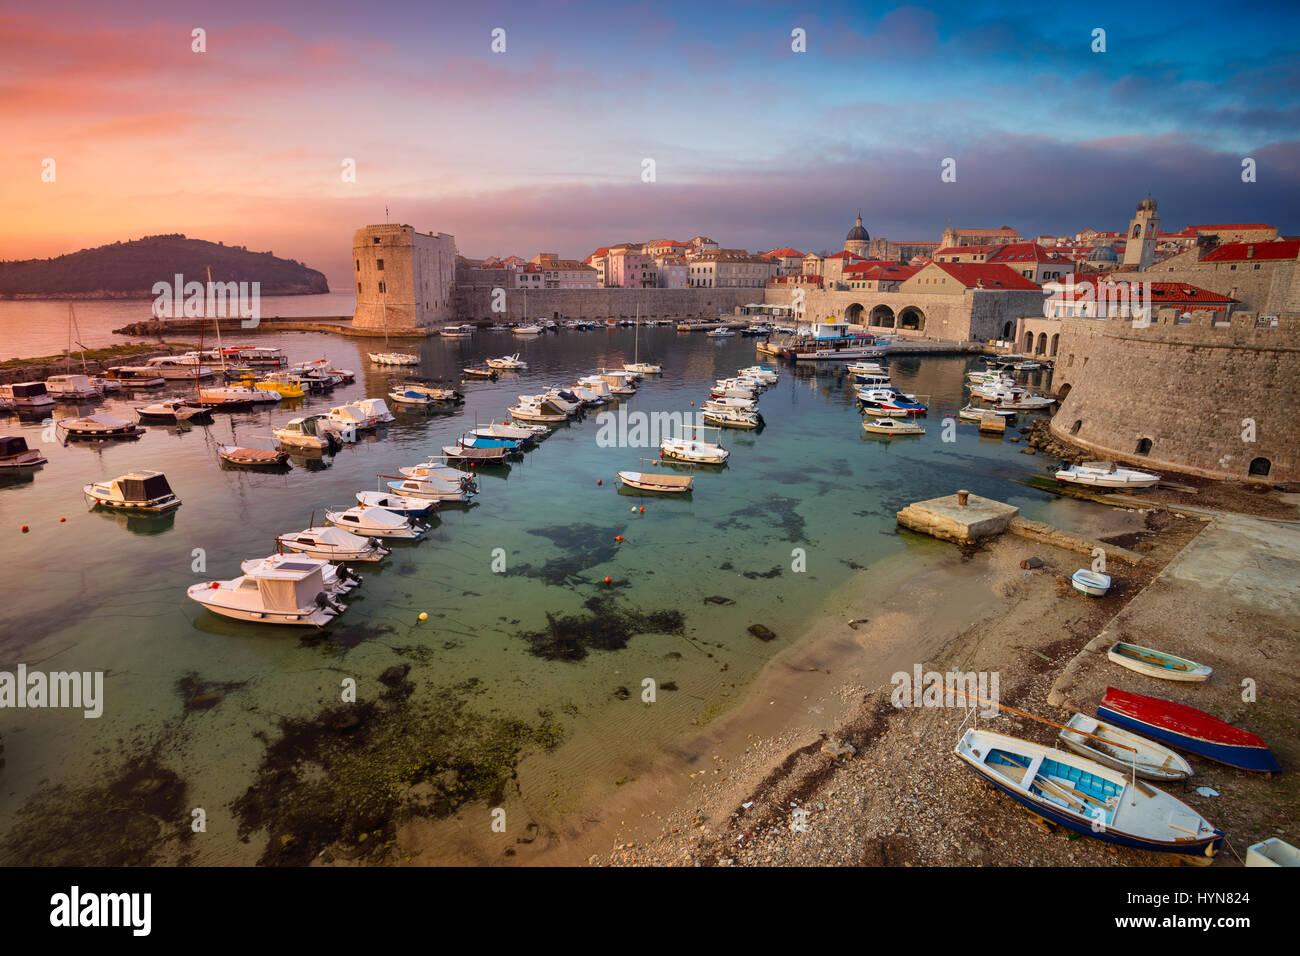 Dubrovnik, Croatia. Beautiful romantic old town of Dubrovnik during sunrise. - Stock Image